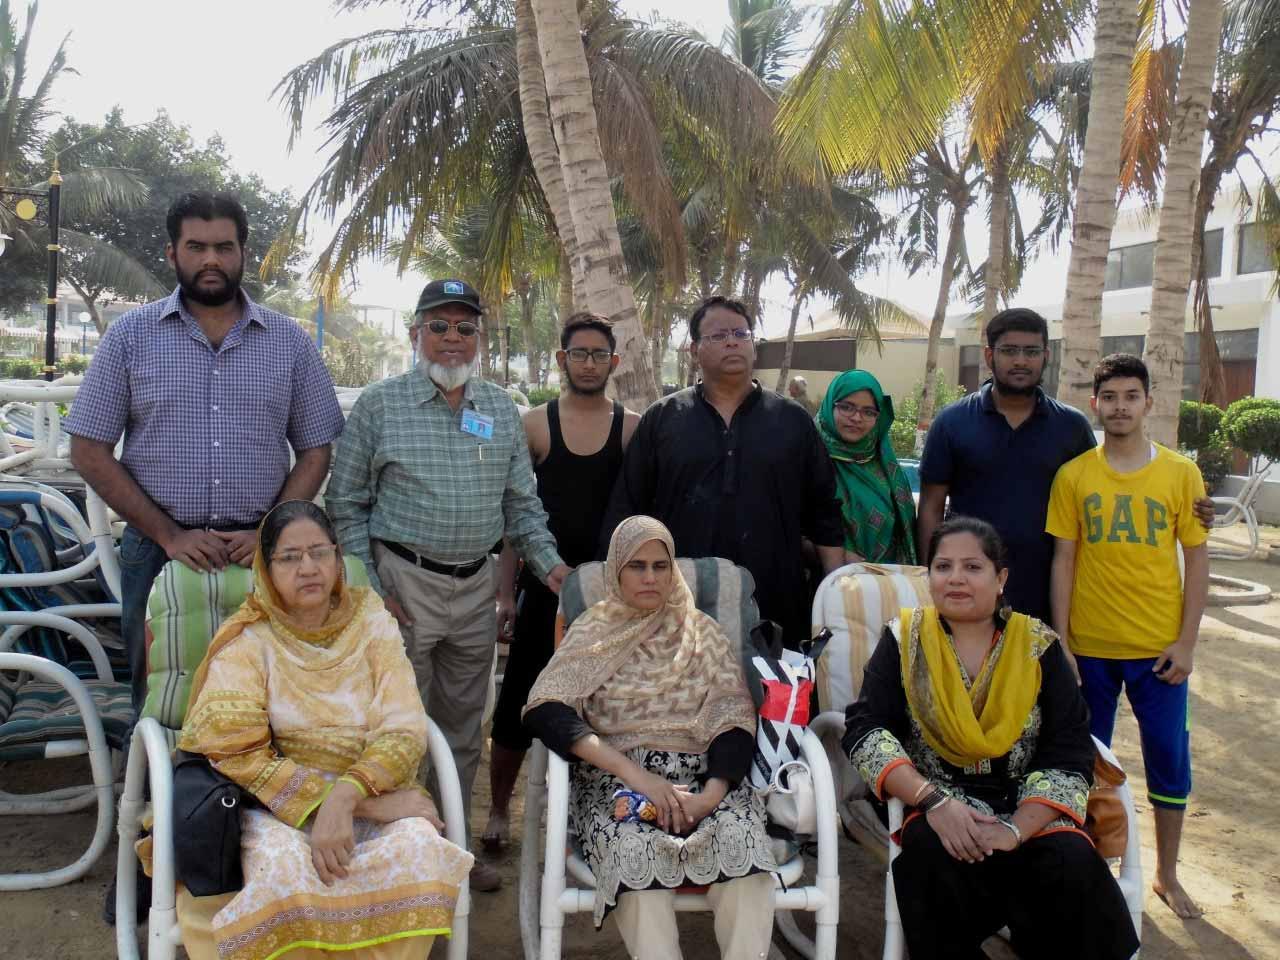 Sitting: Mrs. Zohra Iqbal, Mrs. Rudaba Irshad, Dr. Kiran A. Rehman, Standing: Engr. Bilal Khan, Engr. Iqbal Khan, Zubair, Dr. Ata Ur Rehman, Umaima Bari, Hafiz Anus Bari, Obaid Ur Rehman